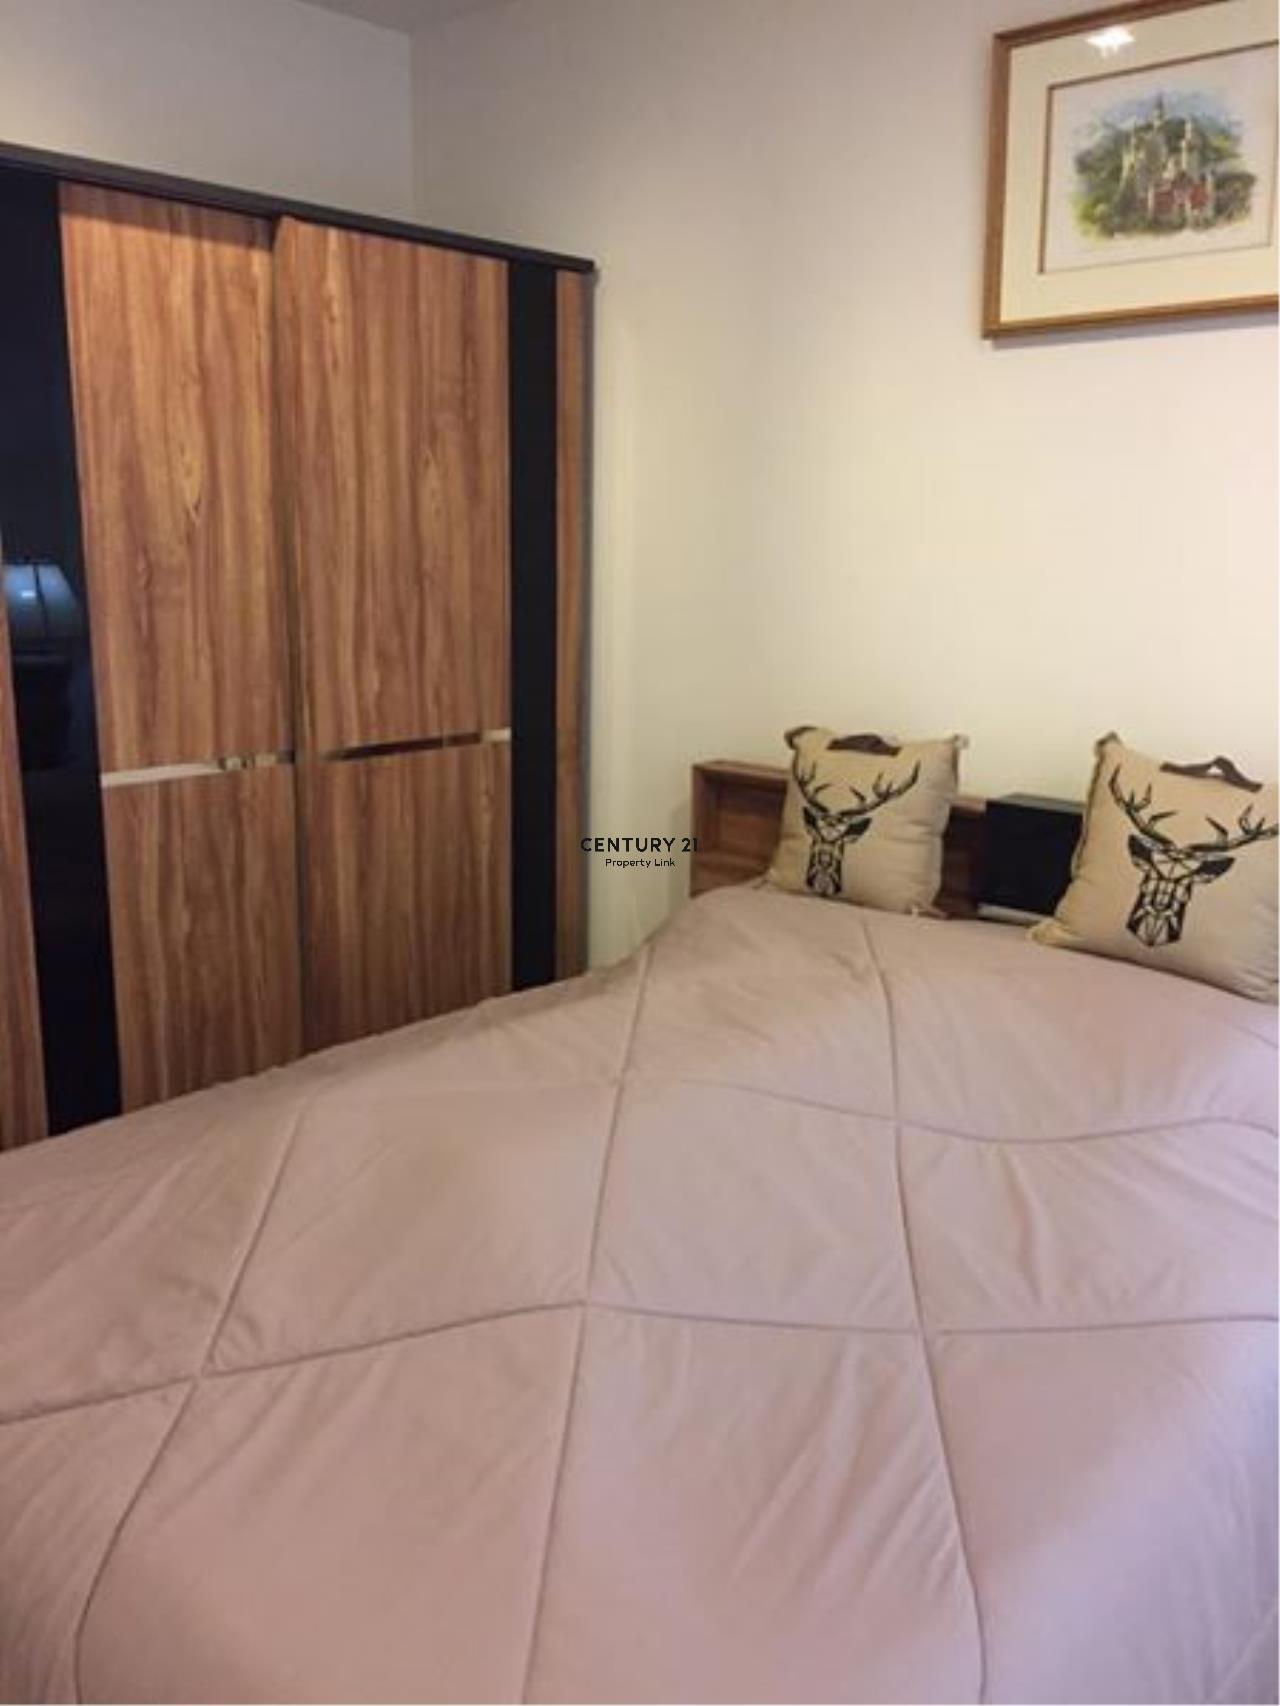 Century21 Property Link Agency's 39-CC-61588 Life Sukhumvit 48 Room For Rent Near BTS Phra Khanong Sukhumvit Road 1 Bedroom 17,000 THB./ Month 3